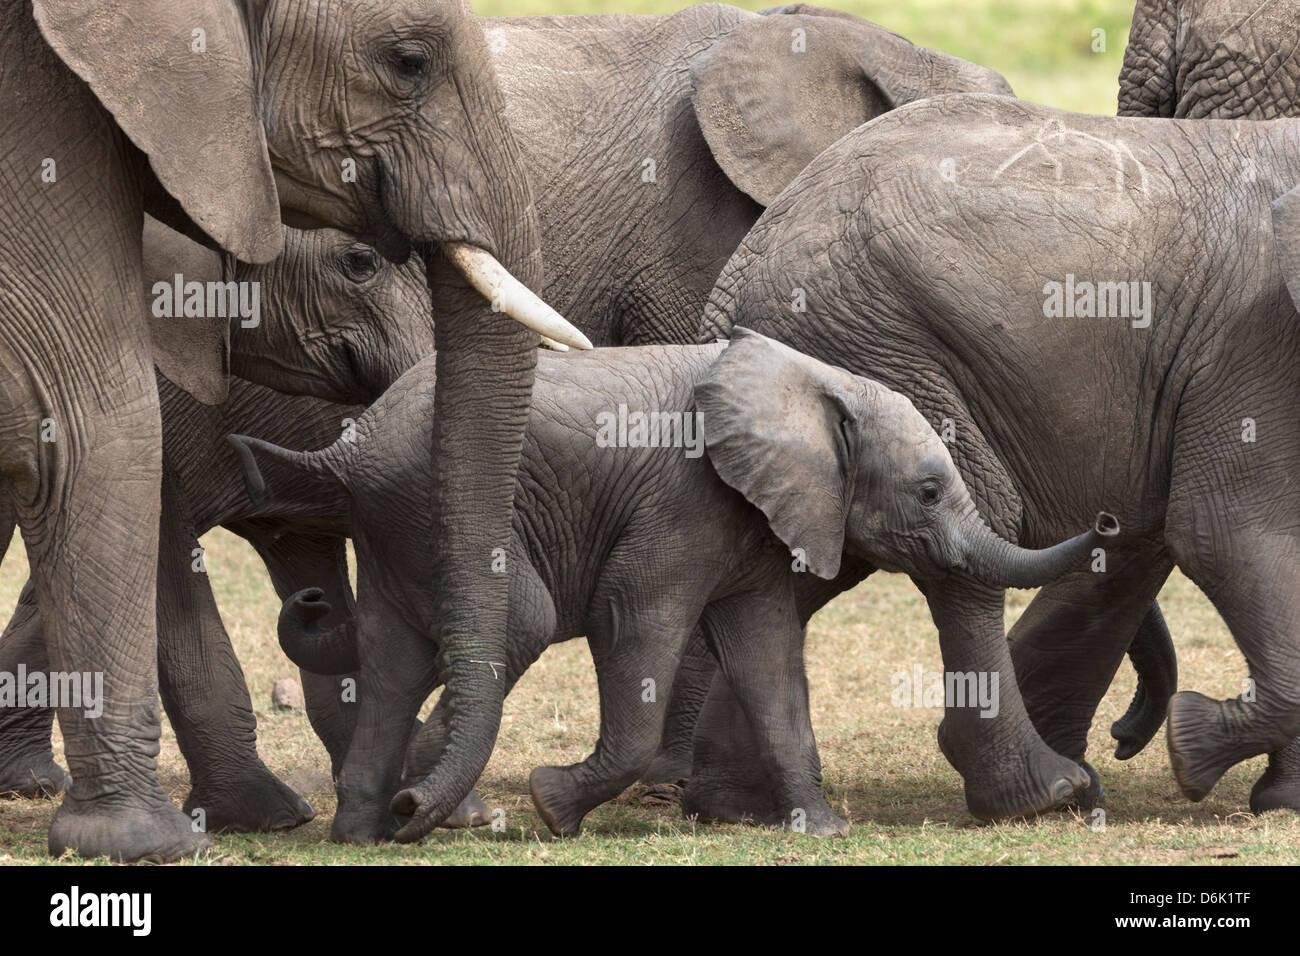 Elephants (Loxodonta africana), Masai Mara National Reserve, Kenya, East Africa, Africa - Stock Image